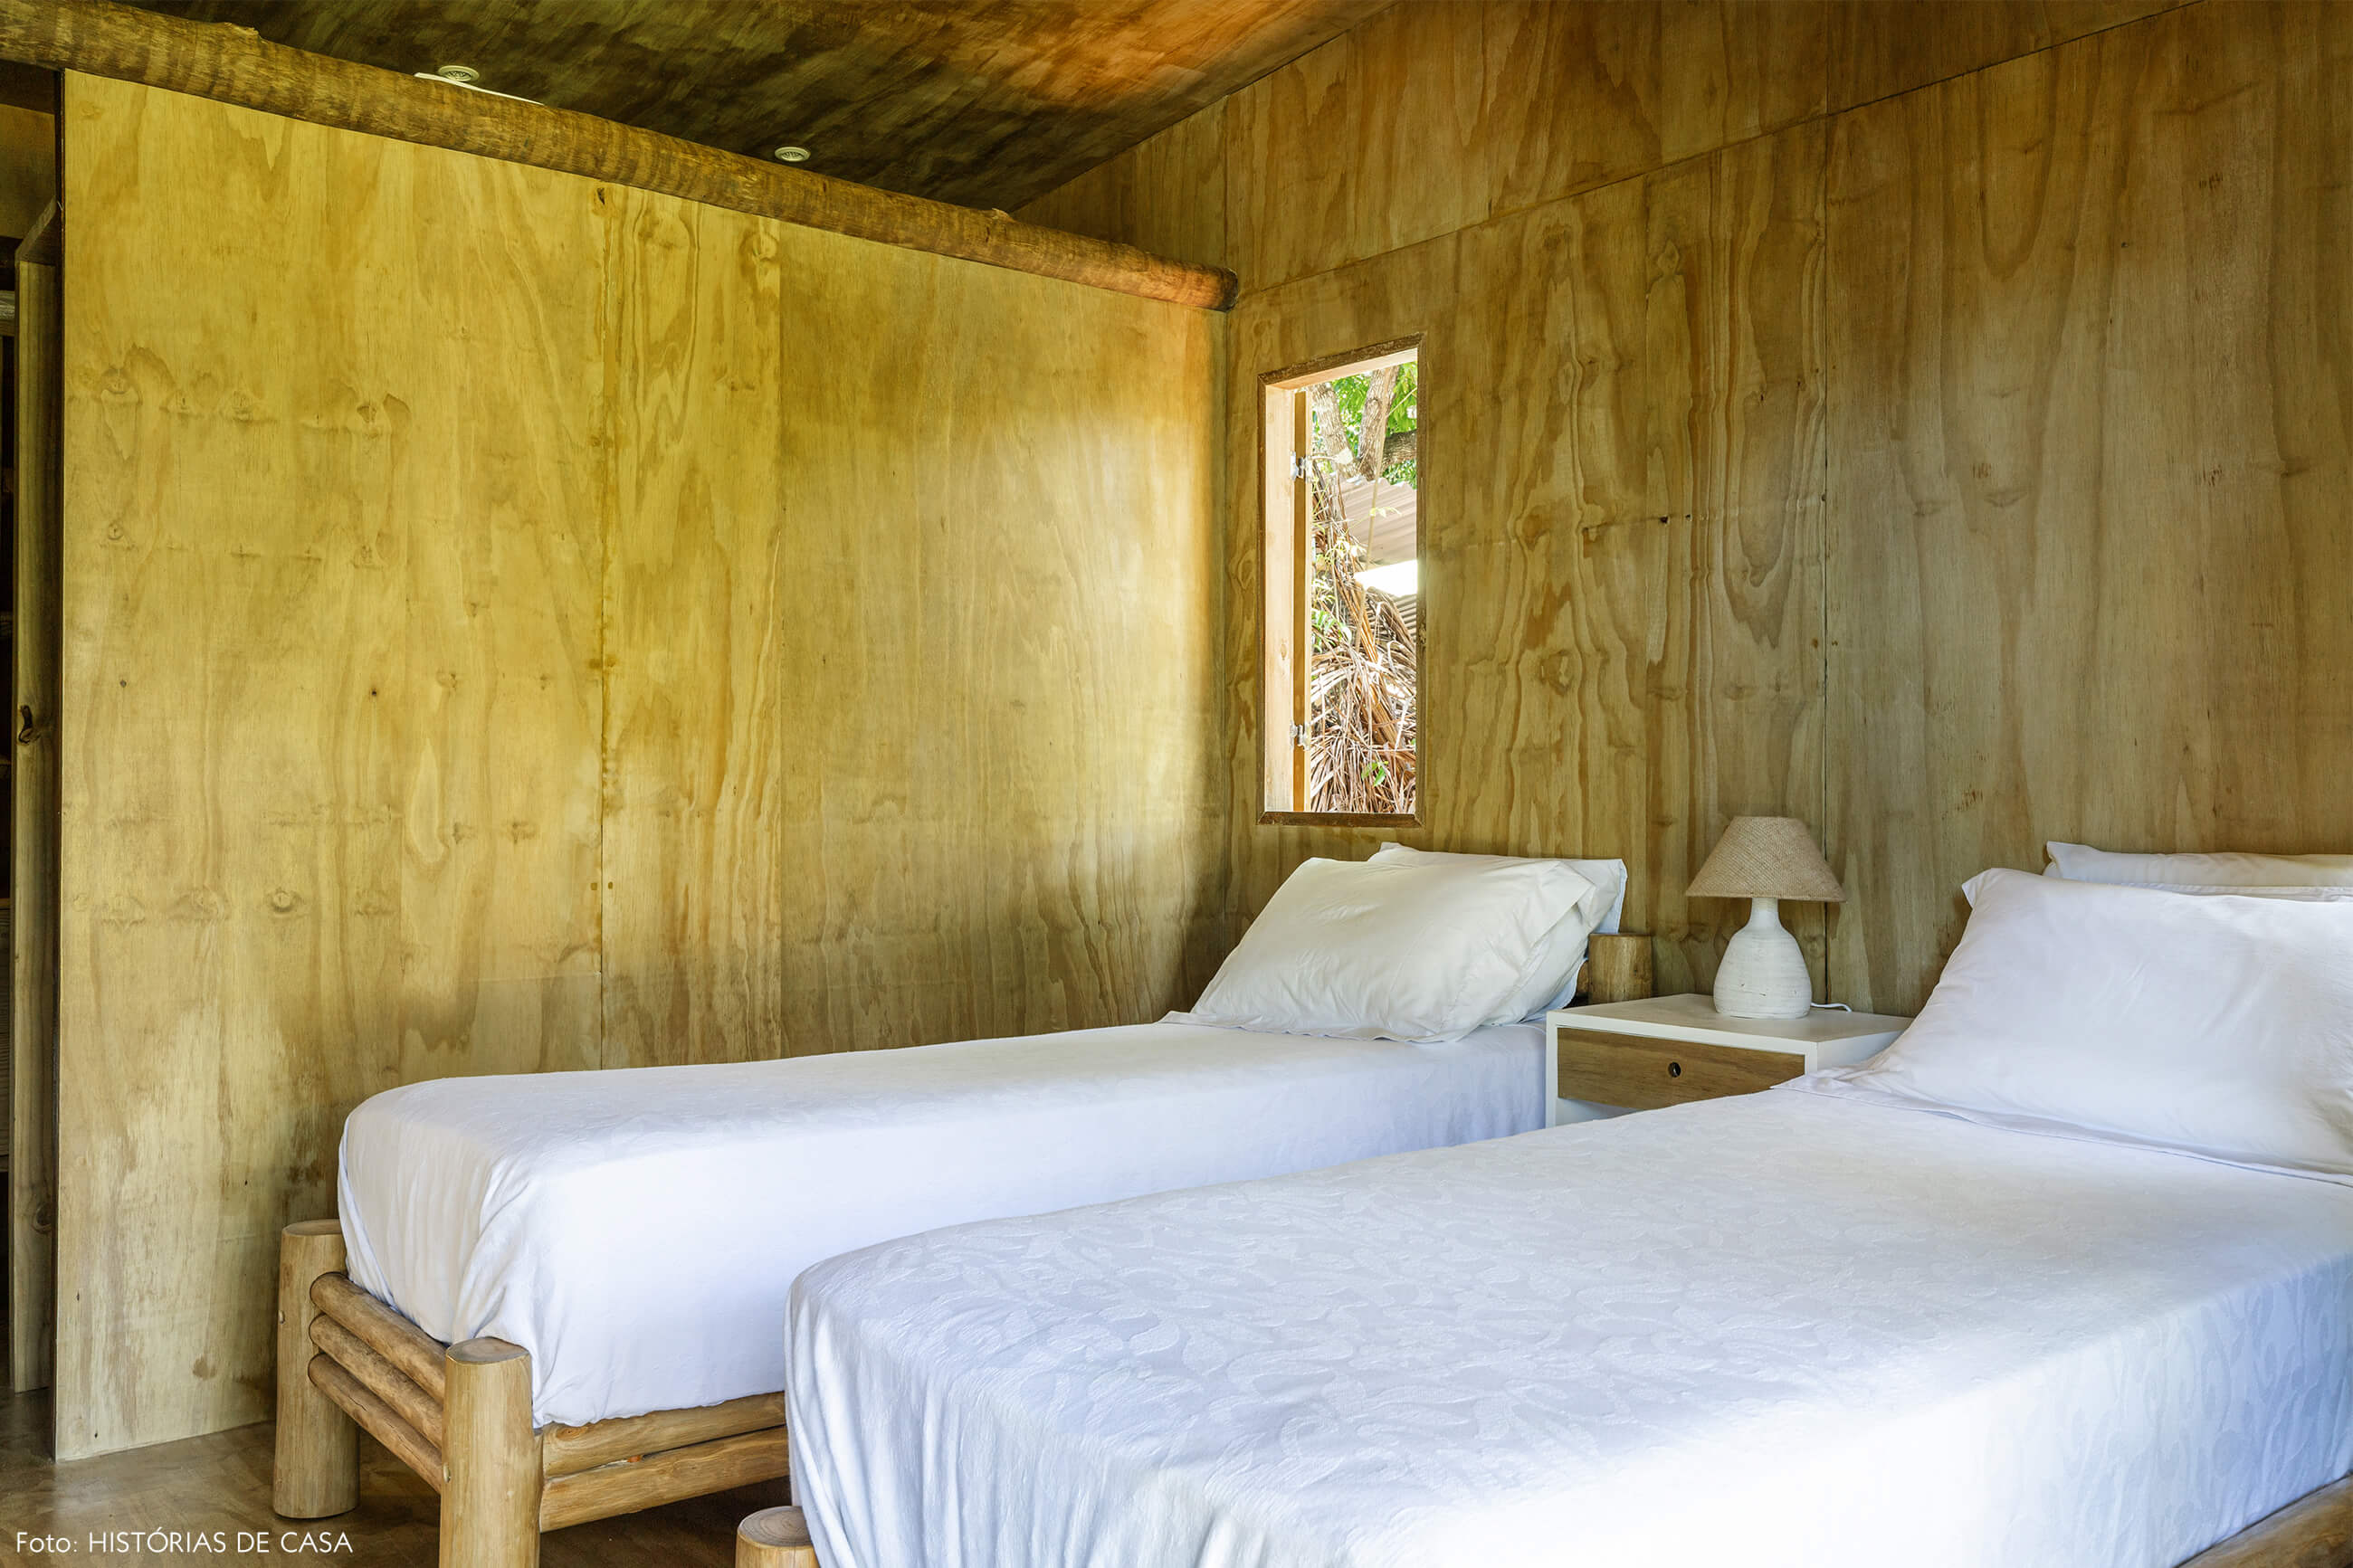 trancoso-decoracao-hotel-villase7e-30-quarto-parede-piso-teto-madeira-abajur-branco